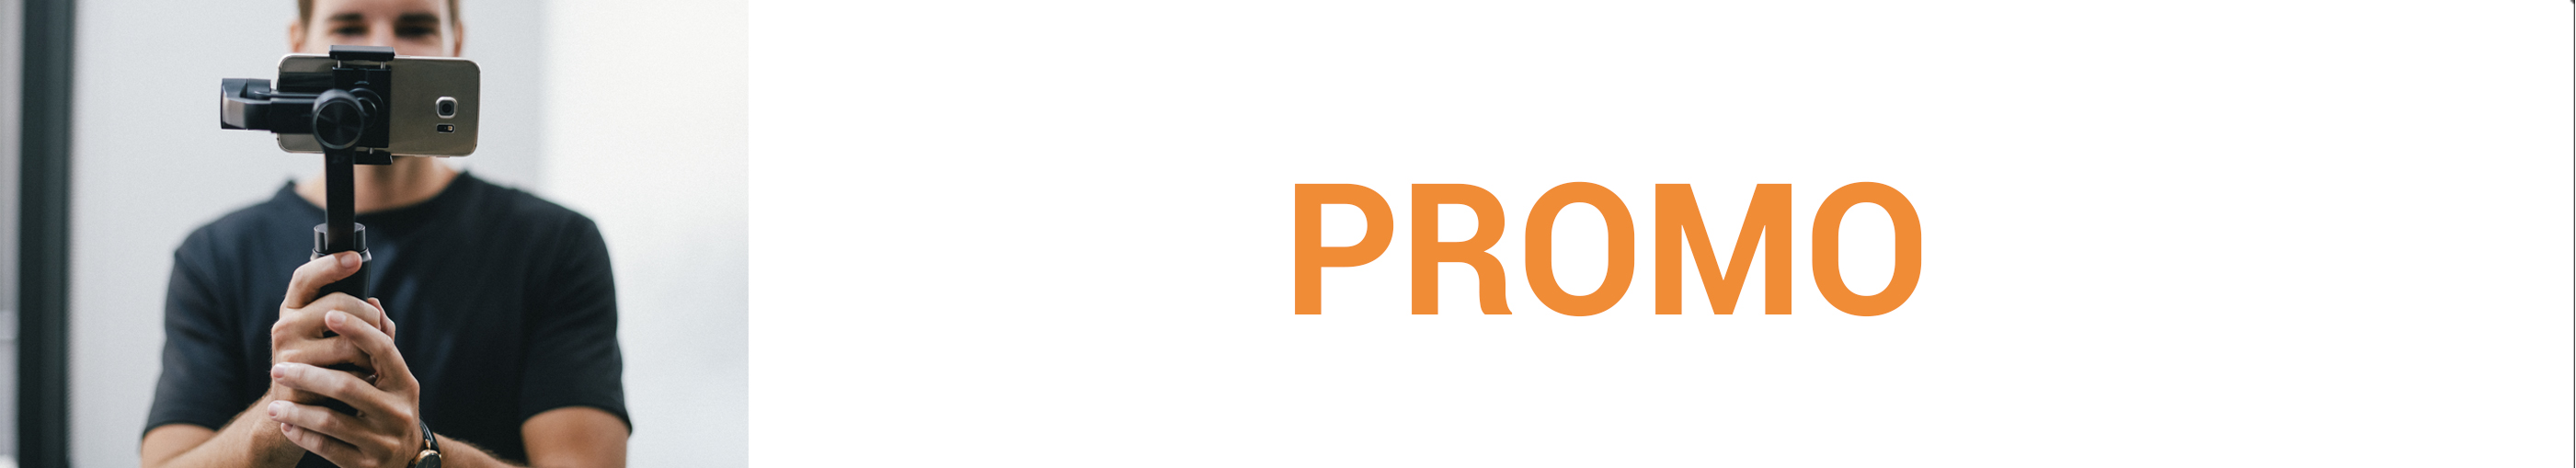 Promo - STAAH Blog